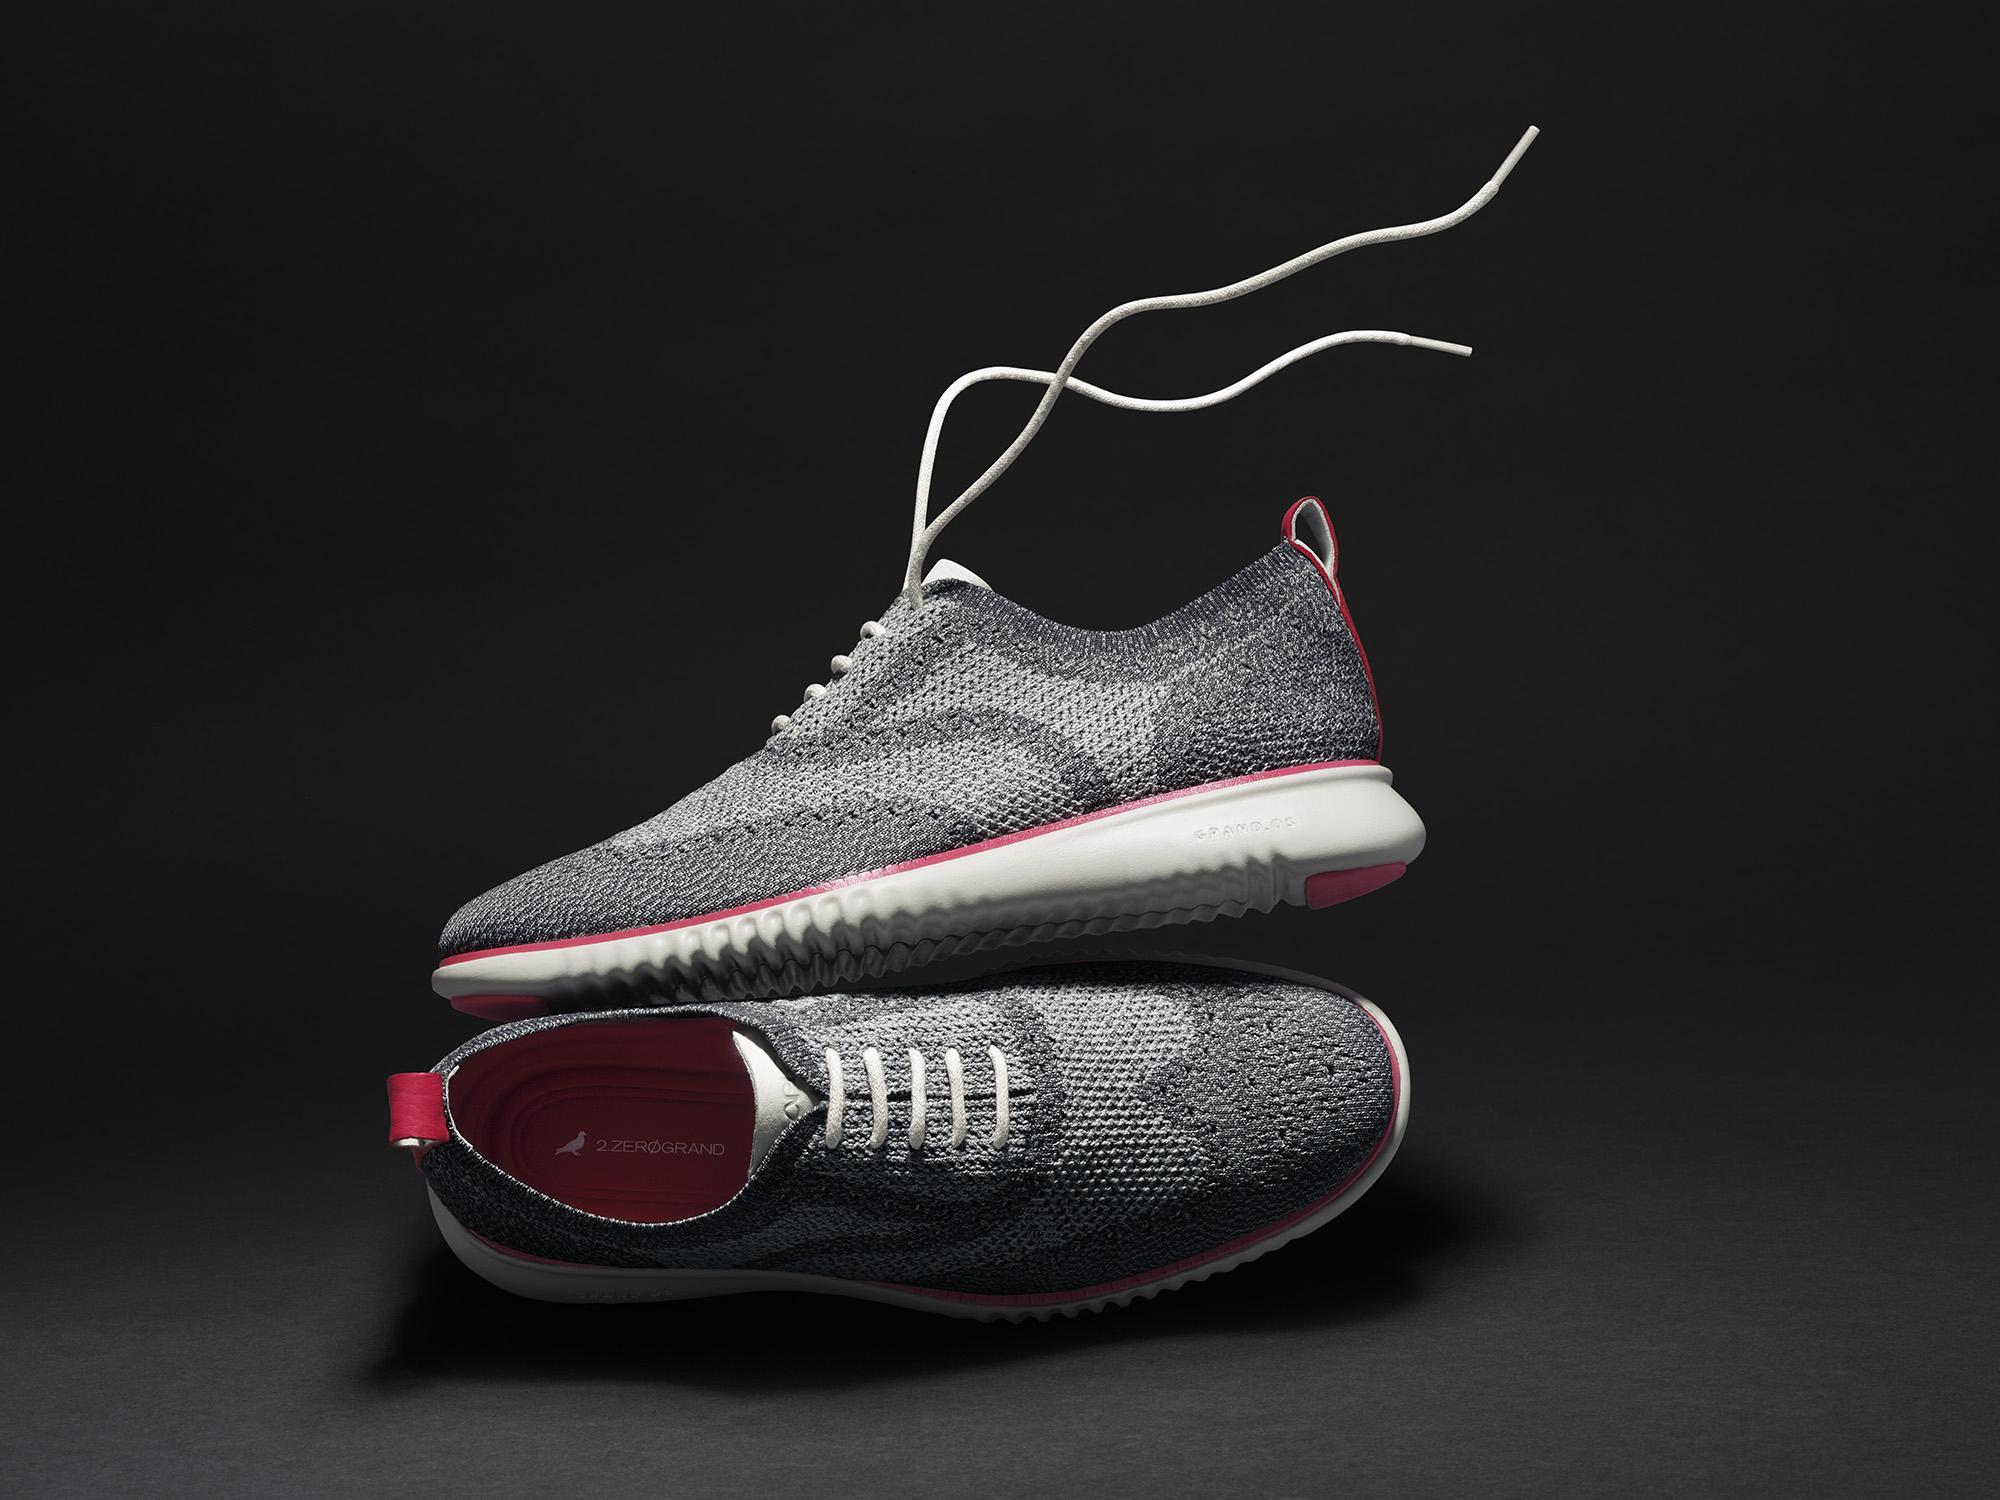 Cole Haan 2.ZERØGRAND Stitchlite™ x Staple Design Sneaker